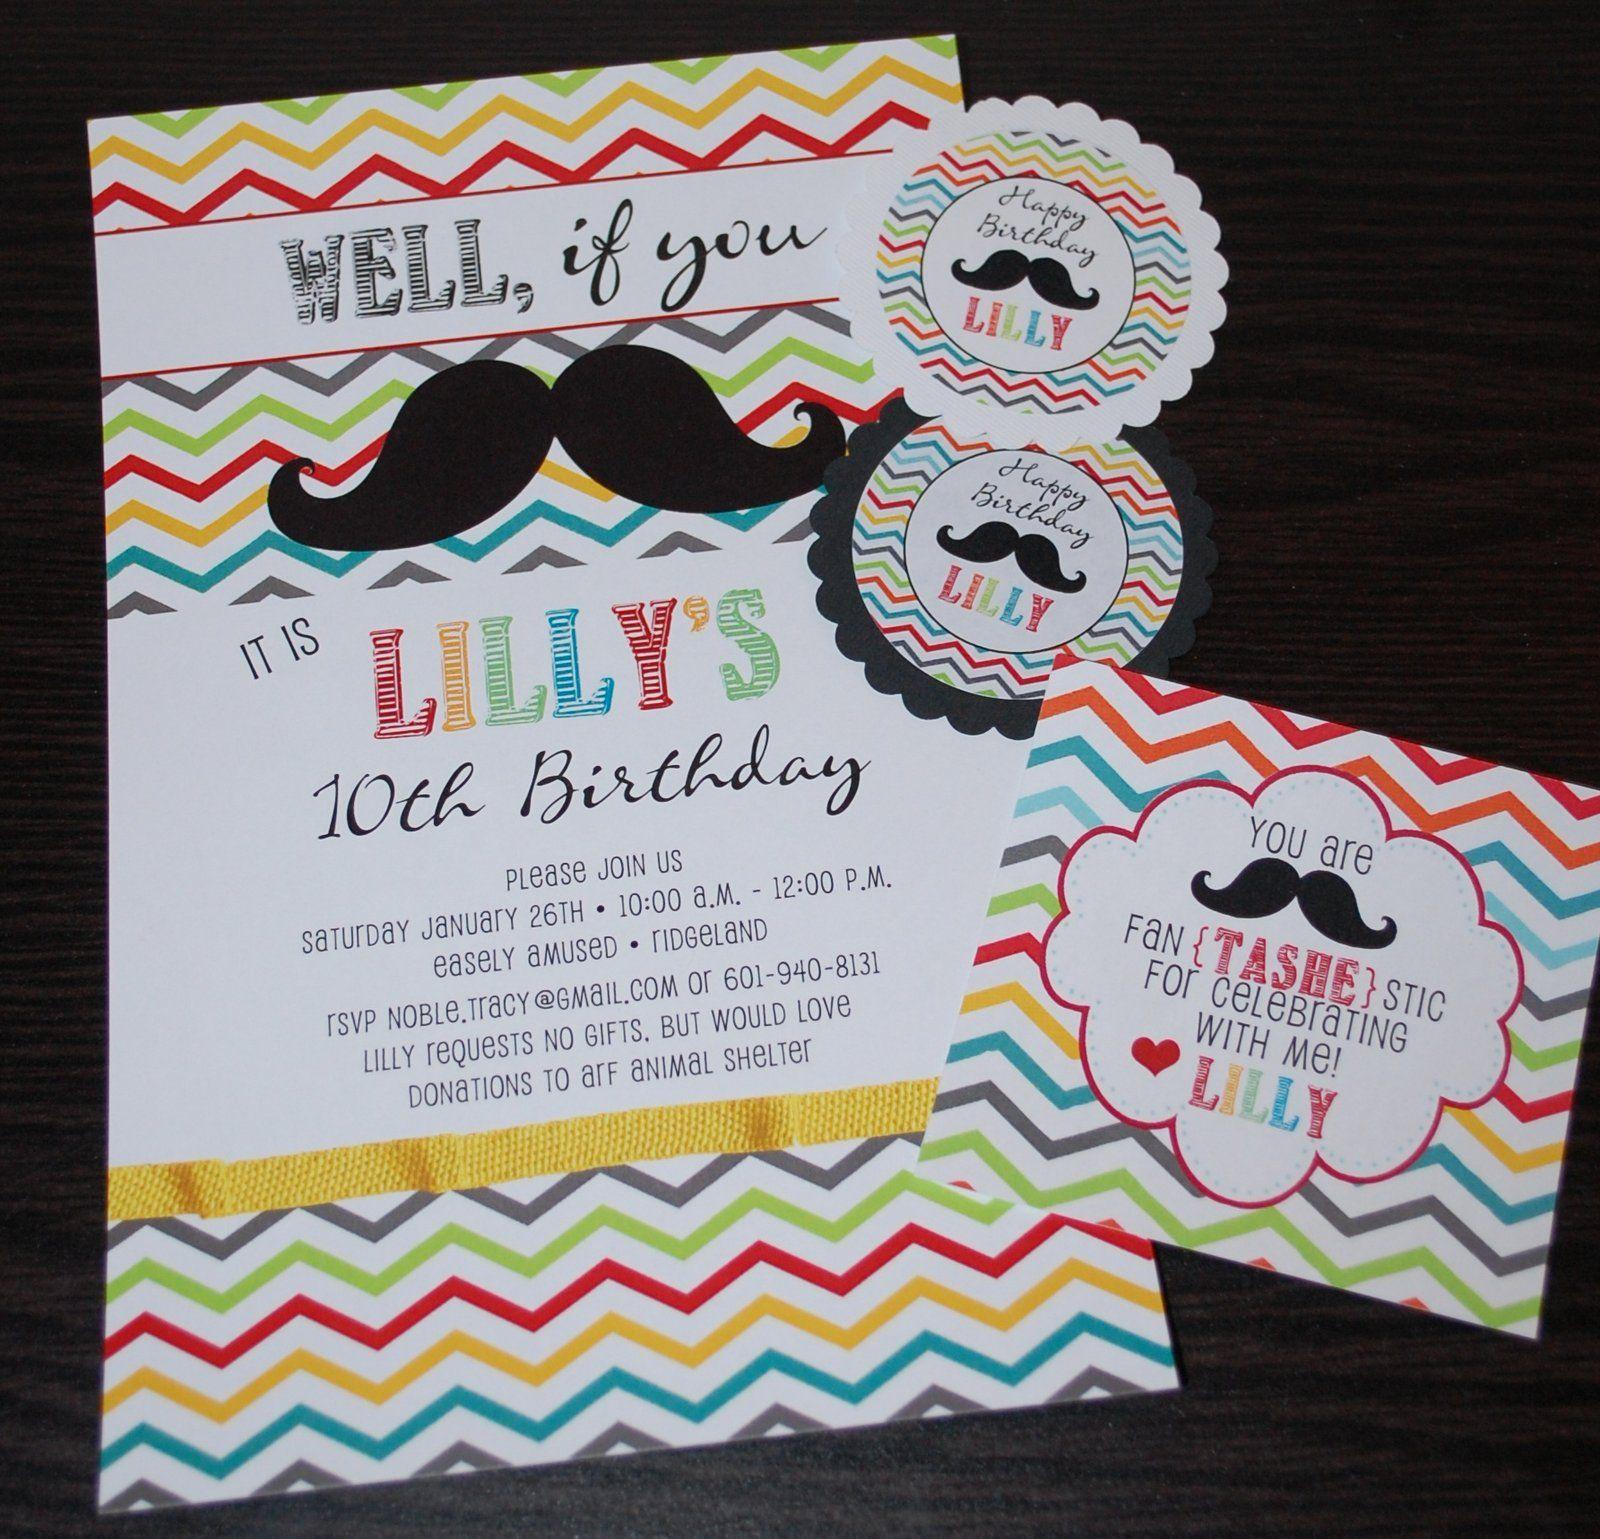 Pin by amiee smith on birthday pinterest mustache birthday cakes birthday party ideas filmwisefo